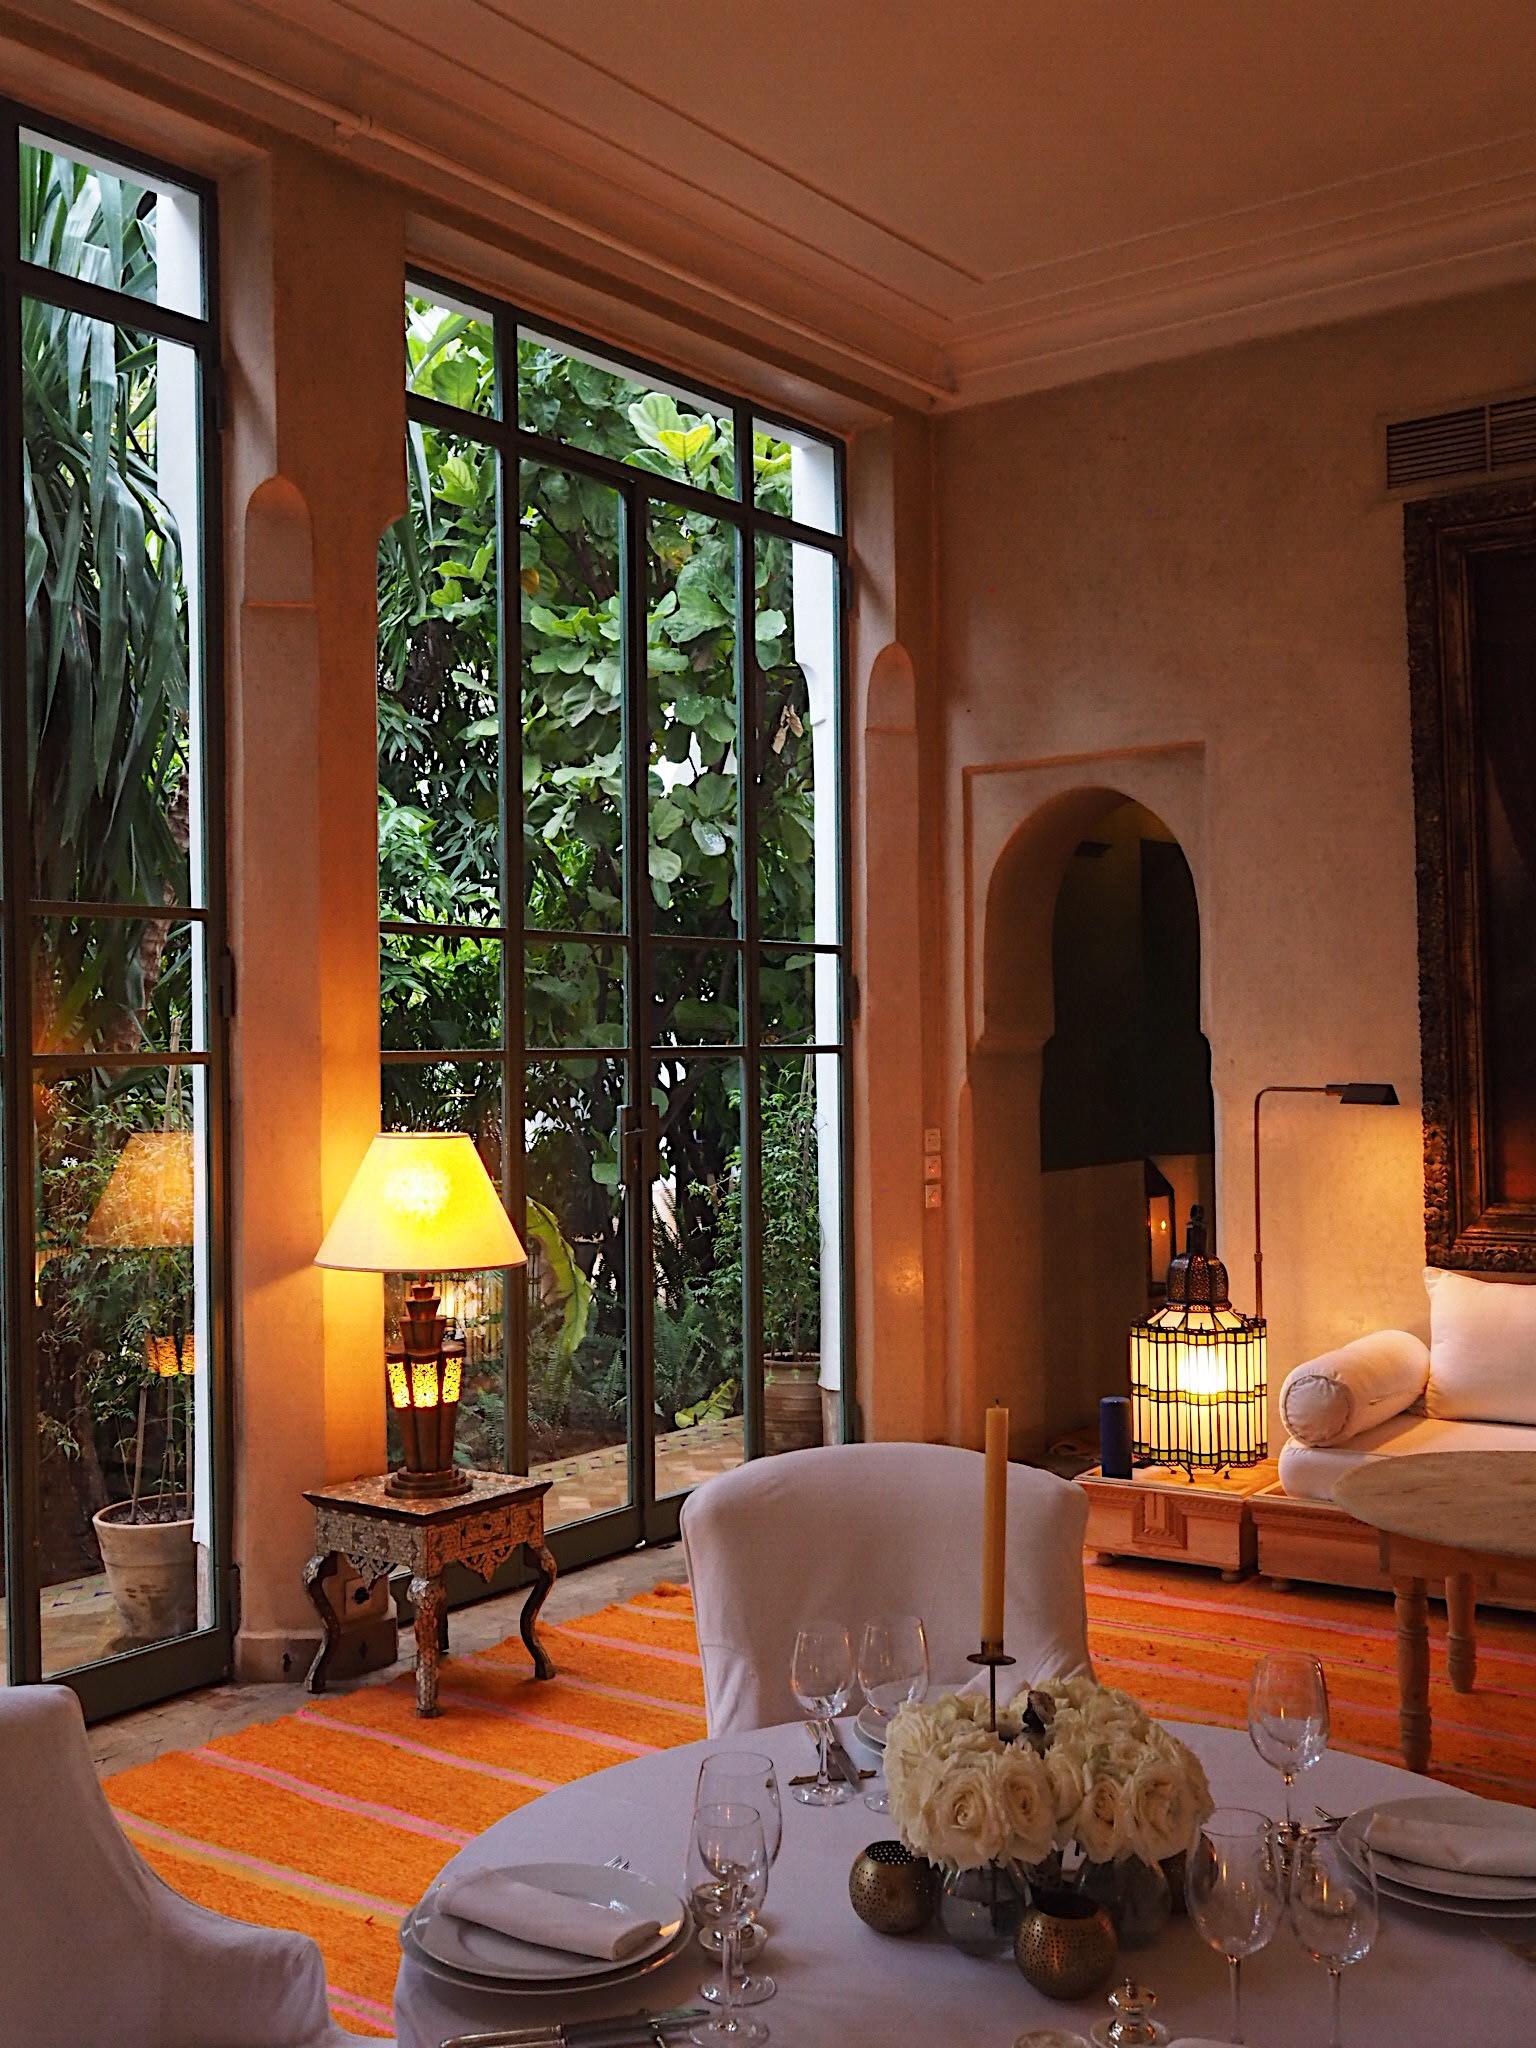 L'Hotel marrakech 2.JPG